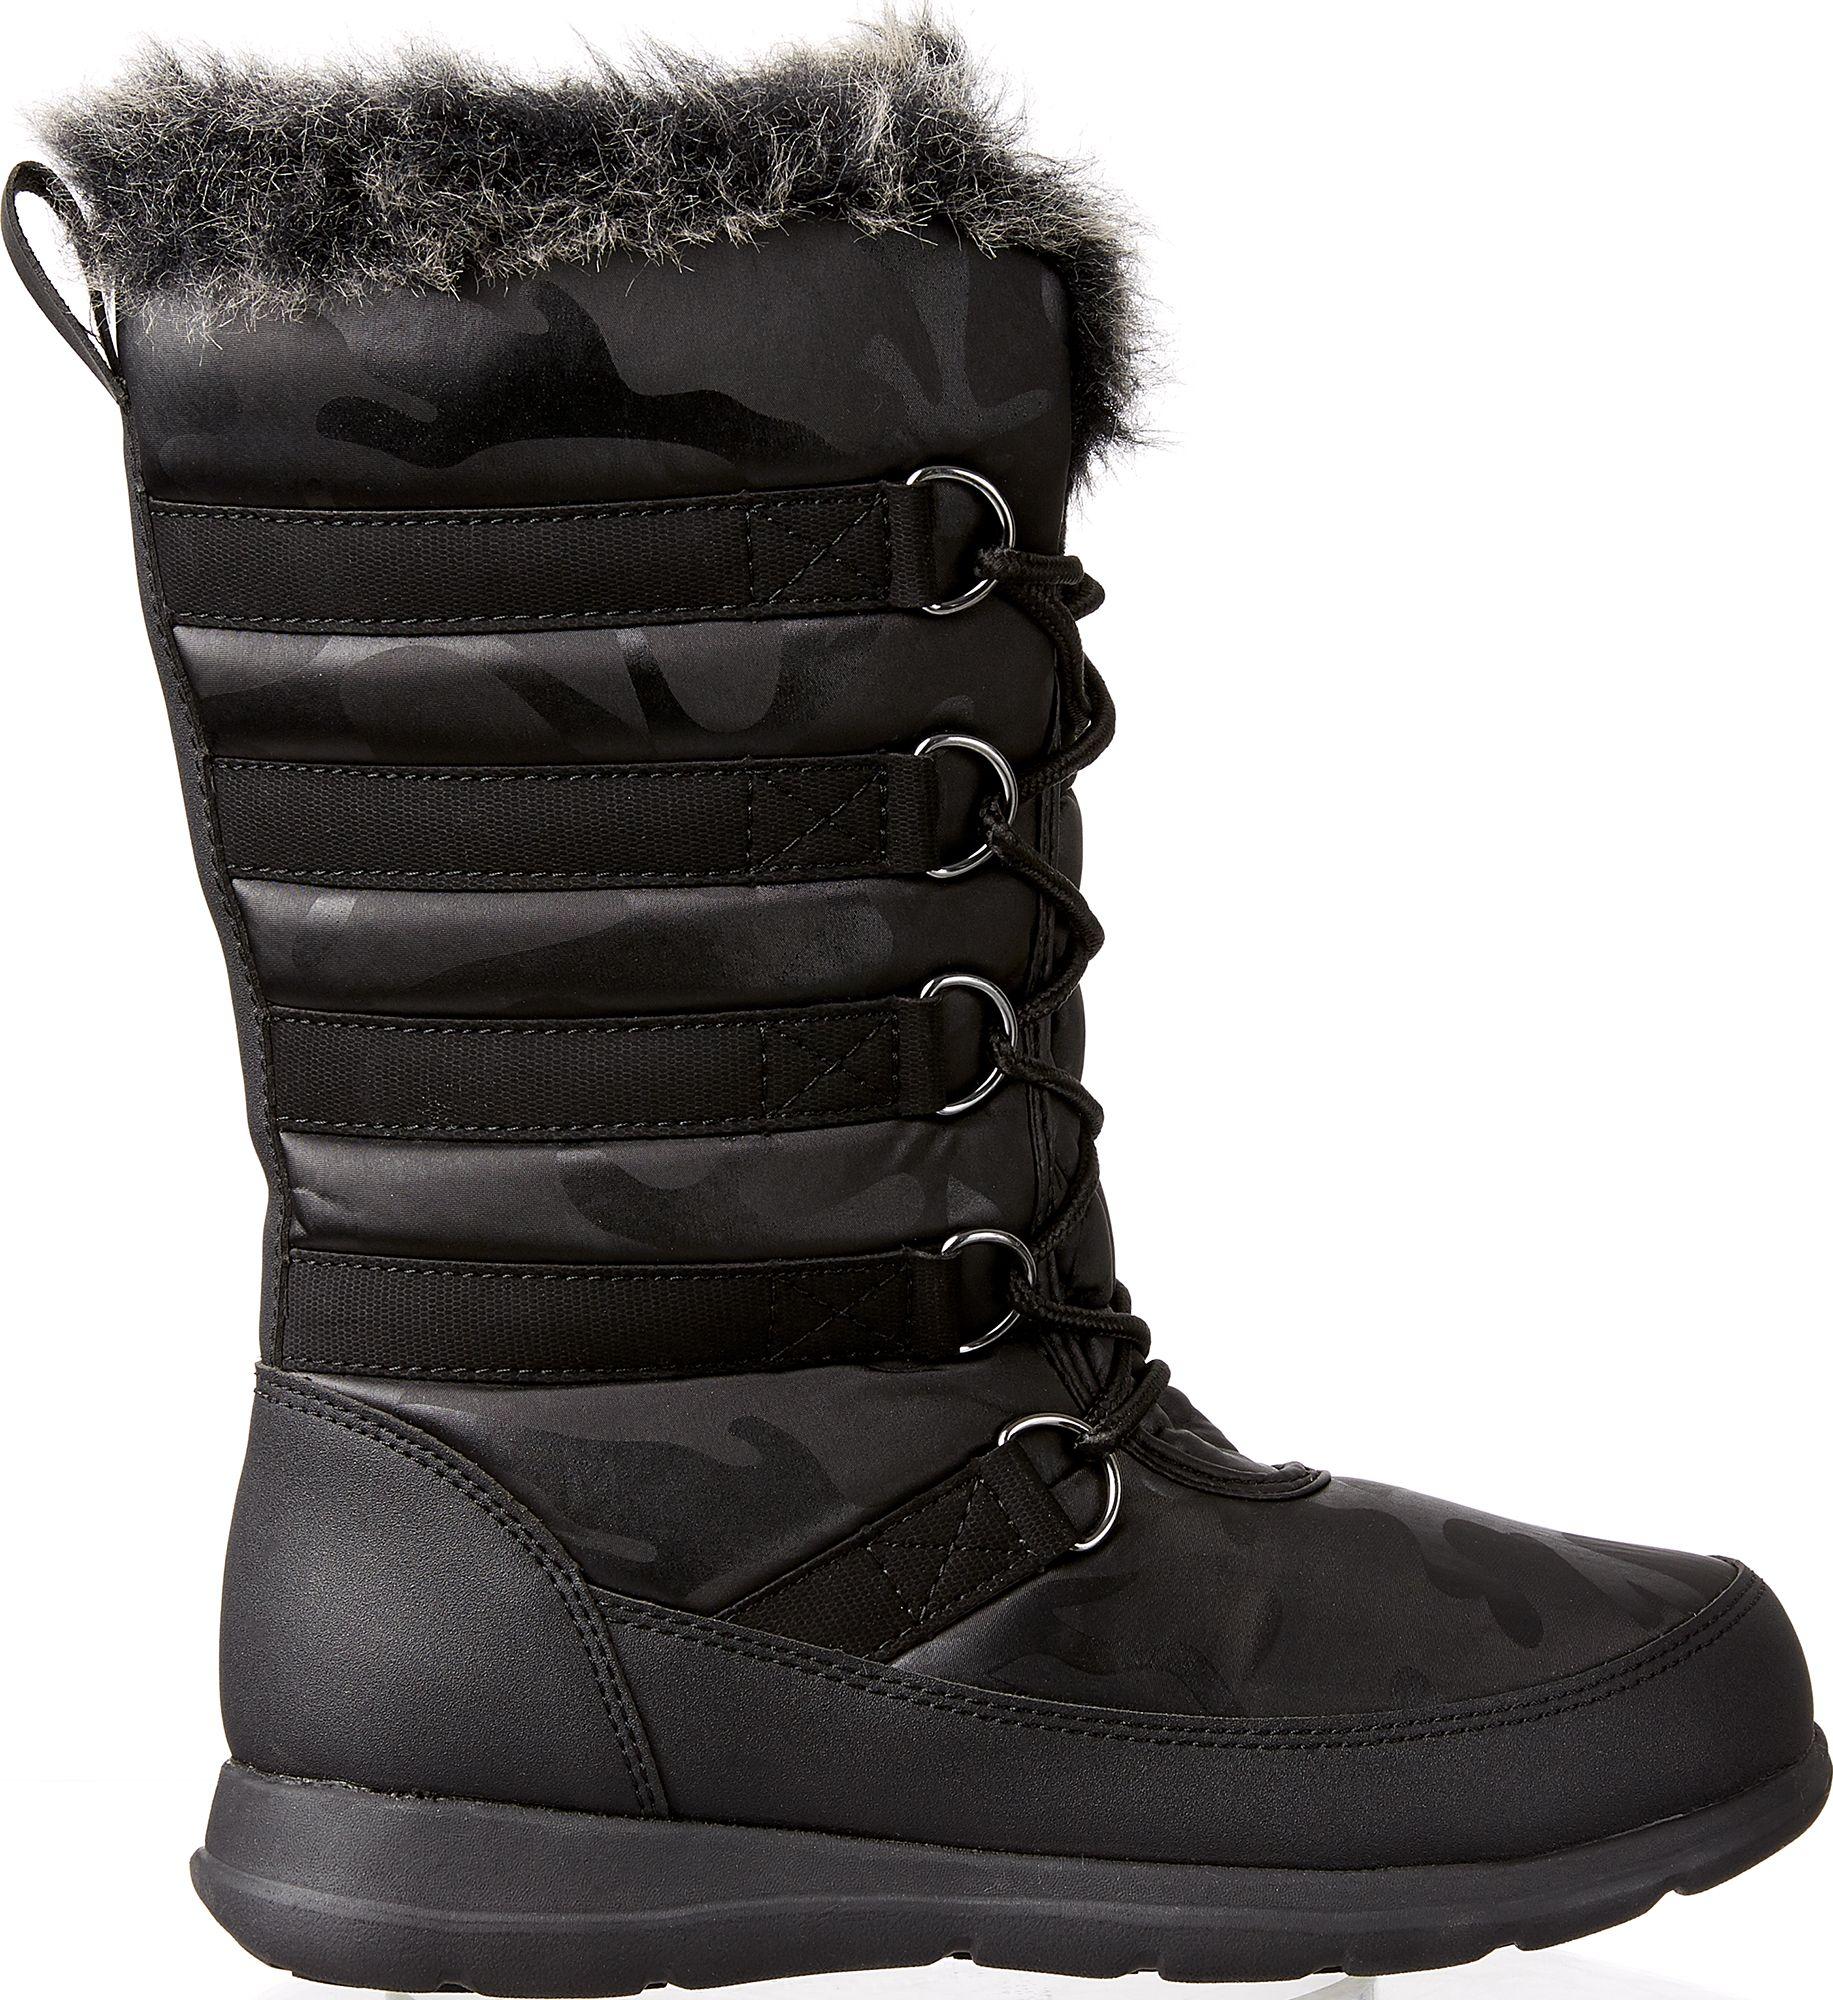 Quest women s arctic storm g winter boots dick s sporting goods